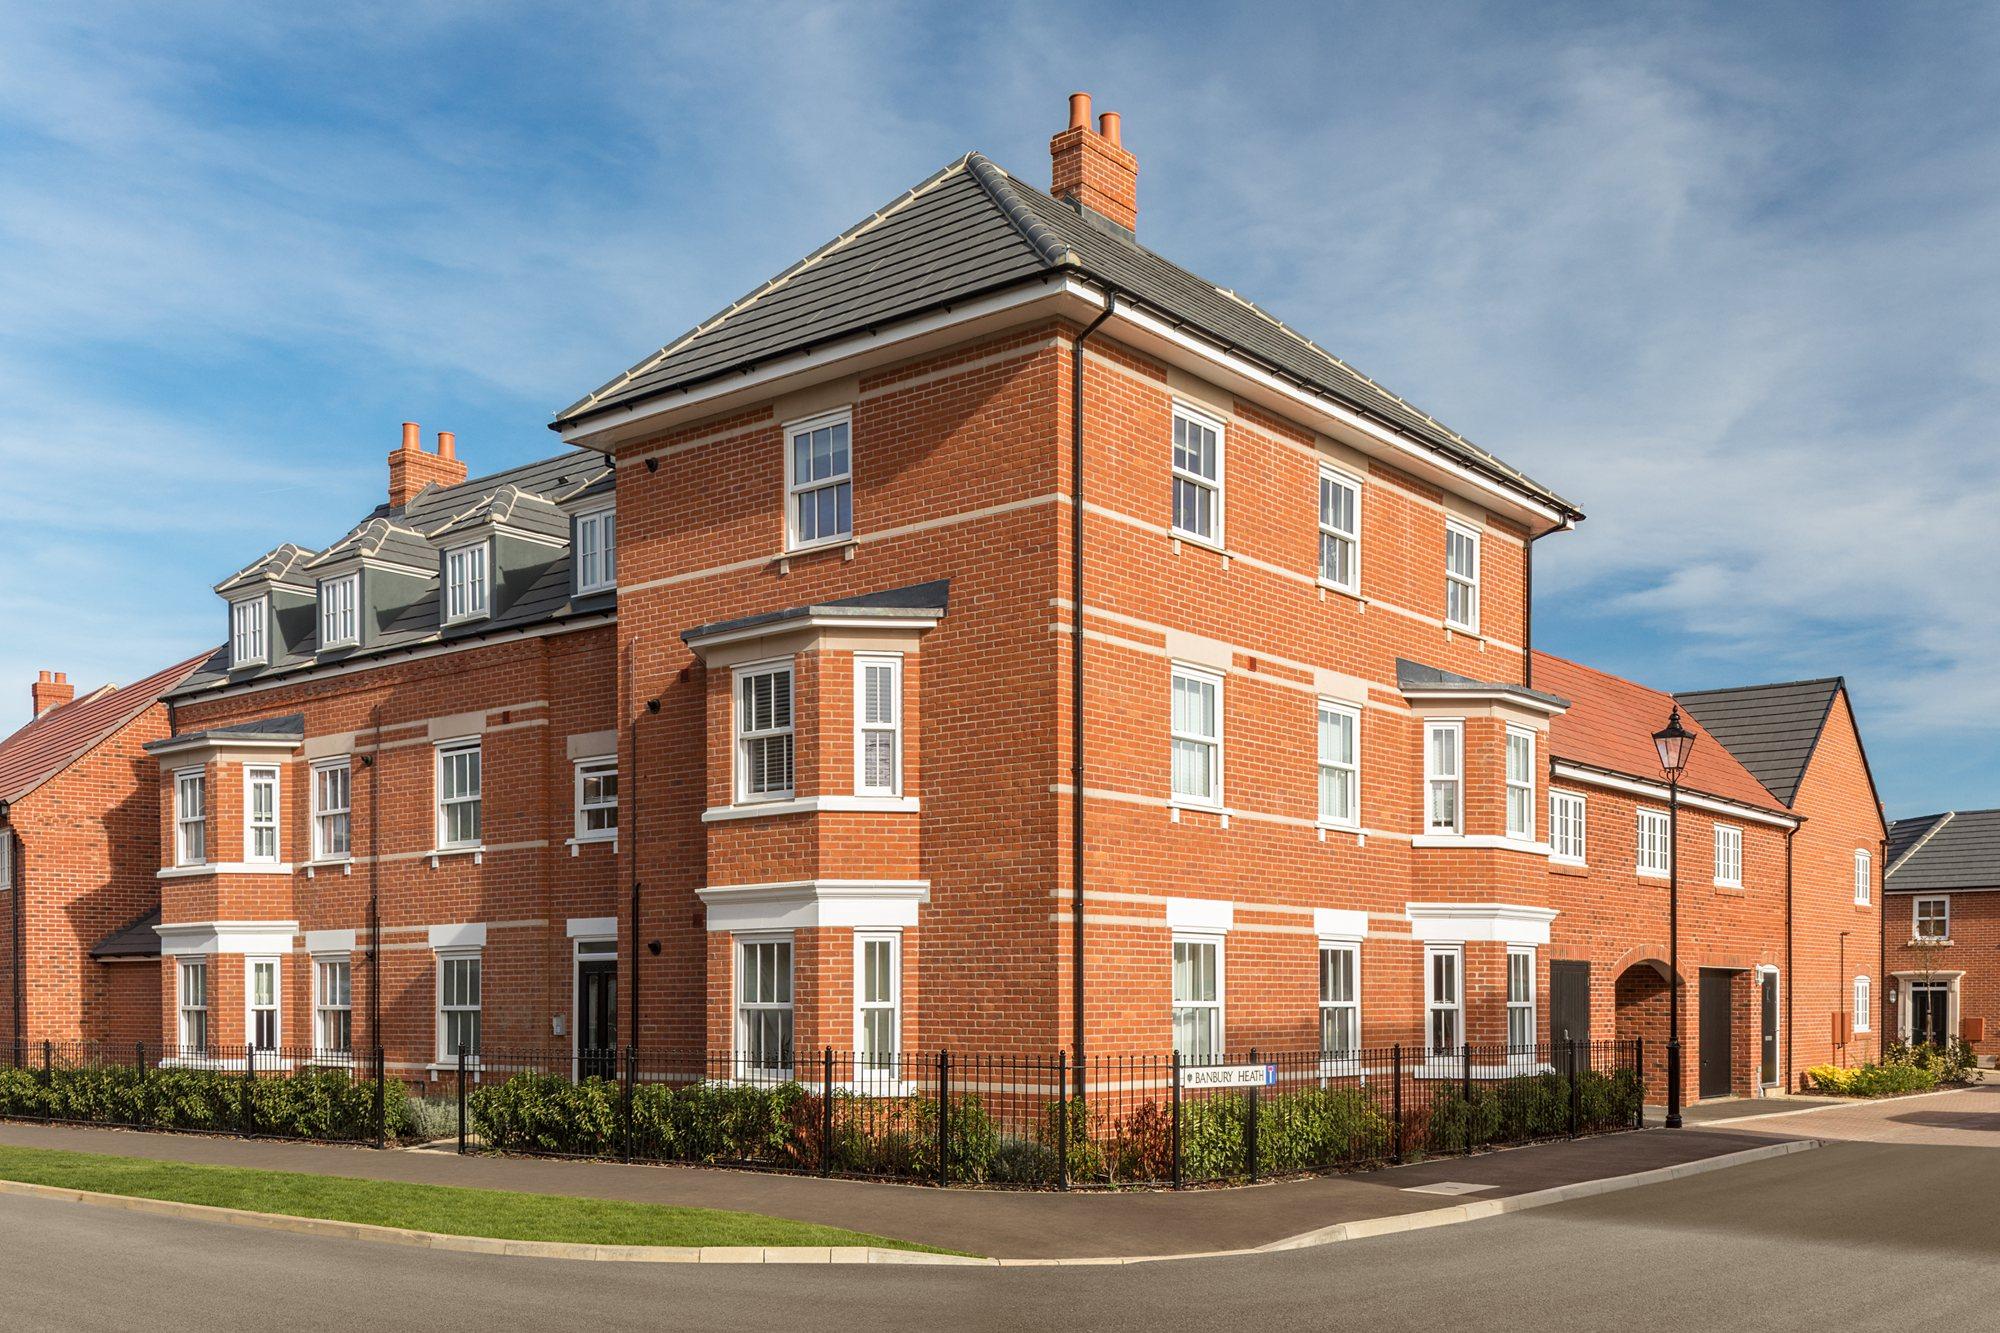 New Build Homes in Great Denham